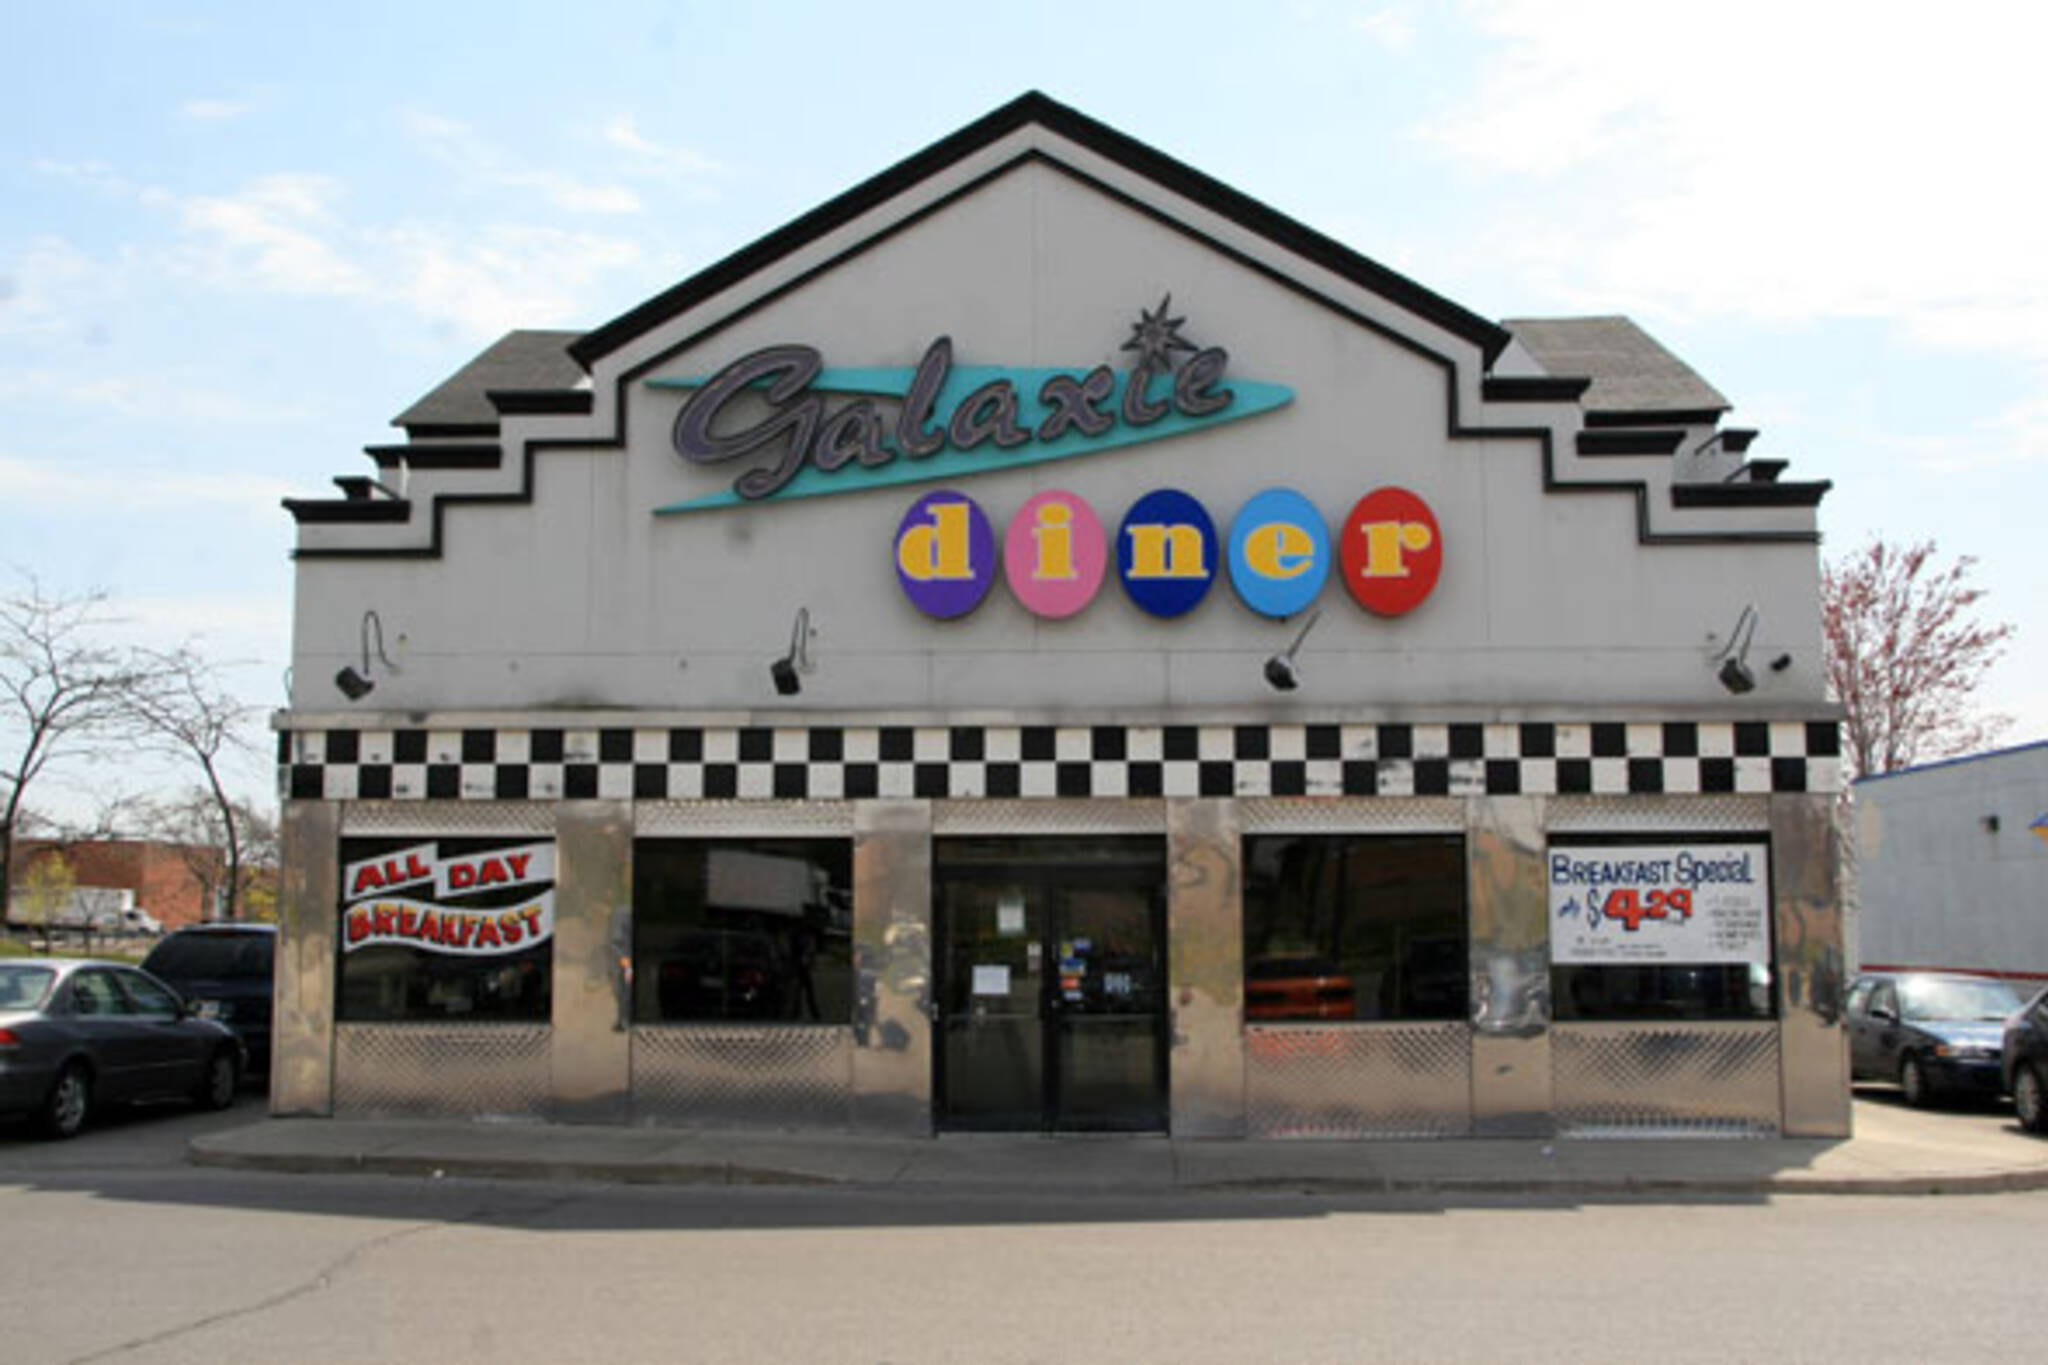 Galaxie Diner